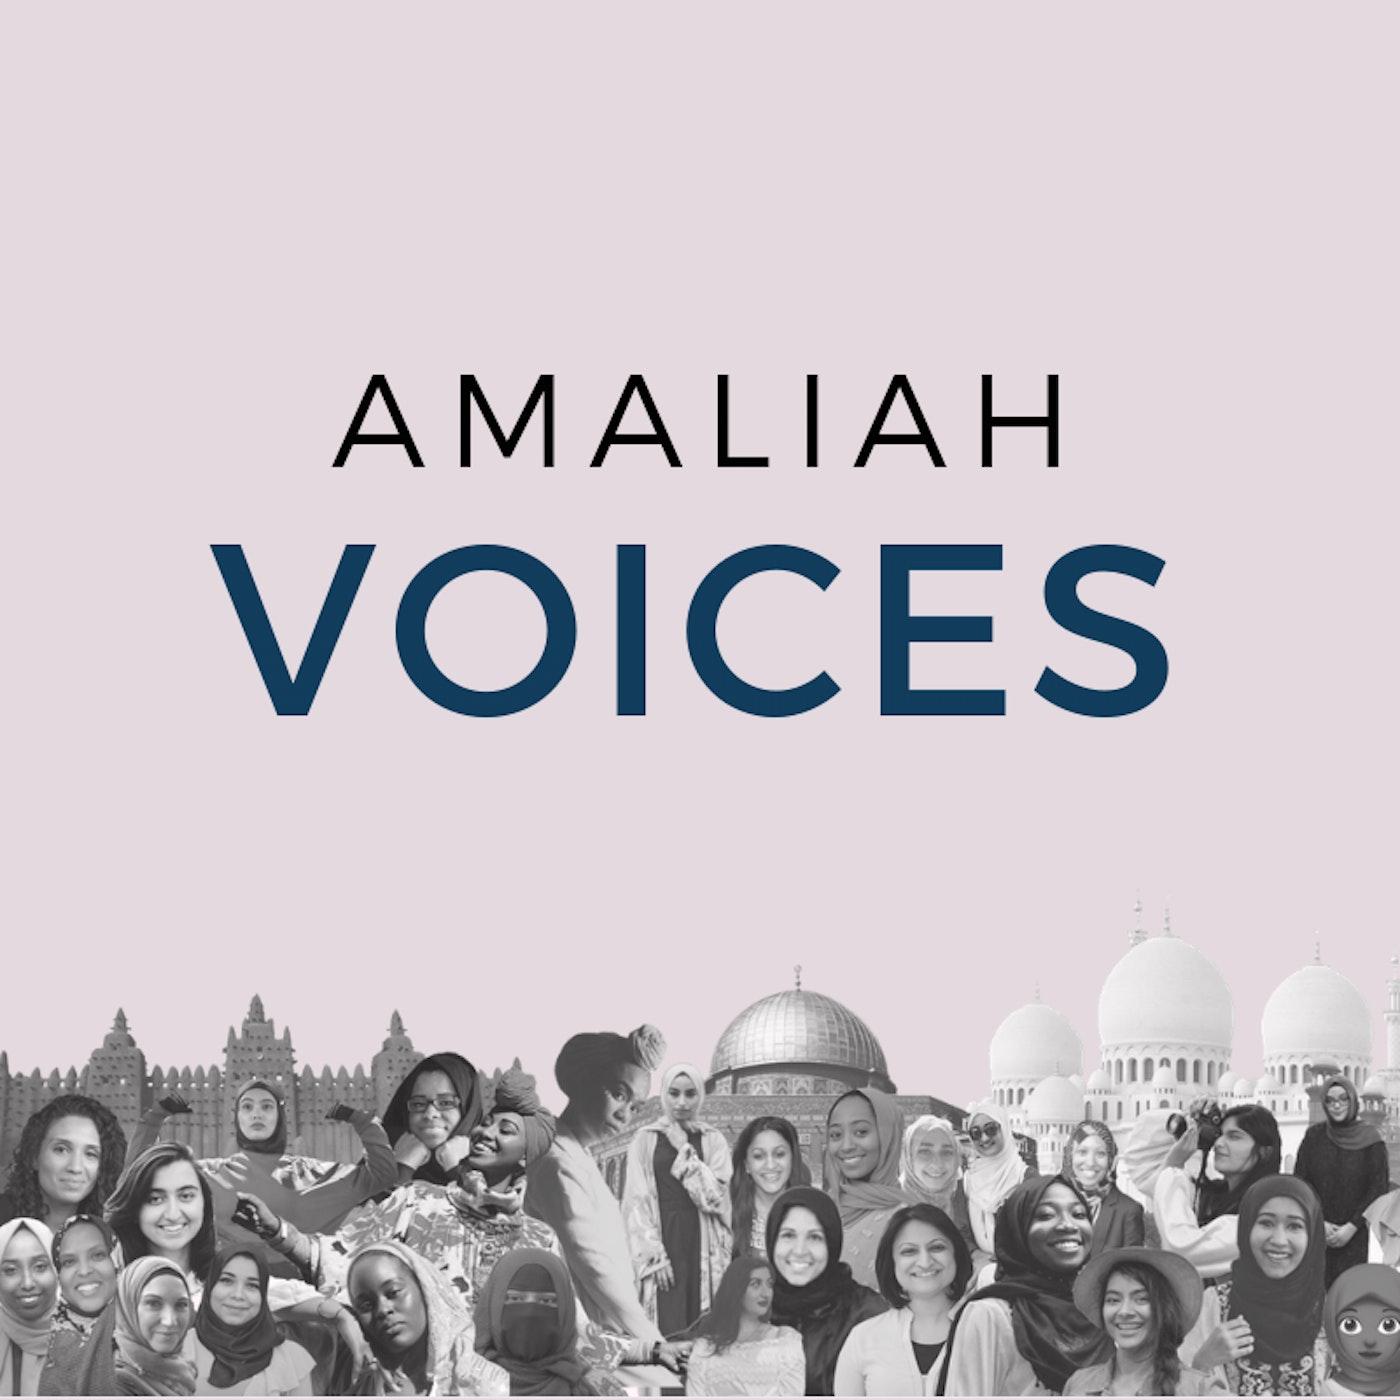 amaliah voices